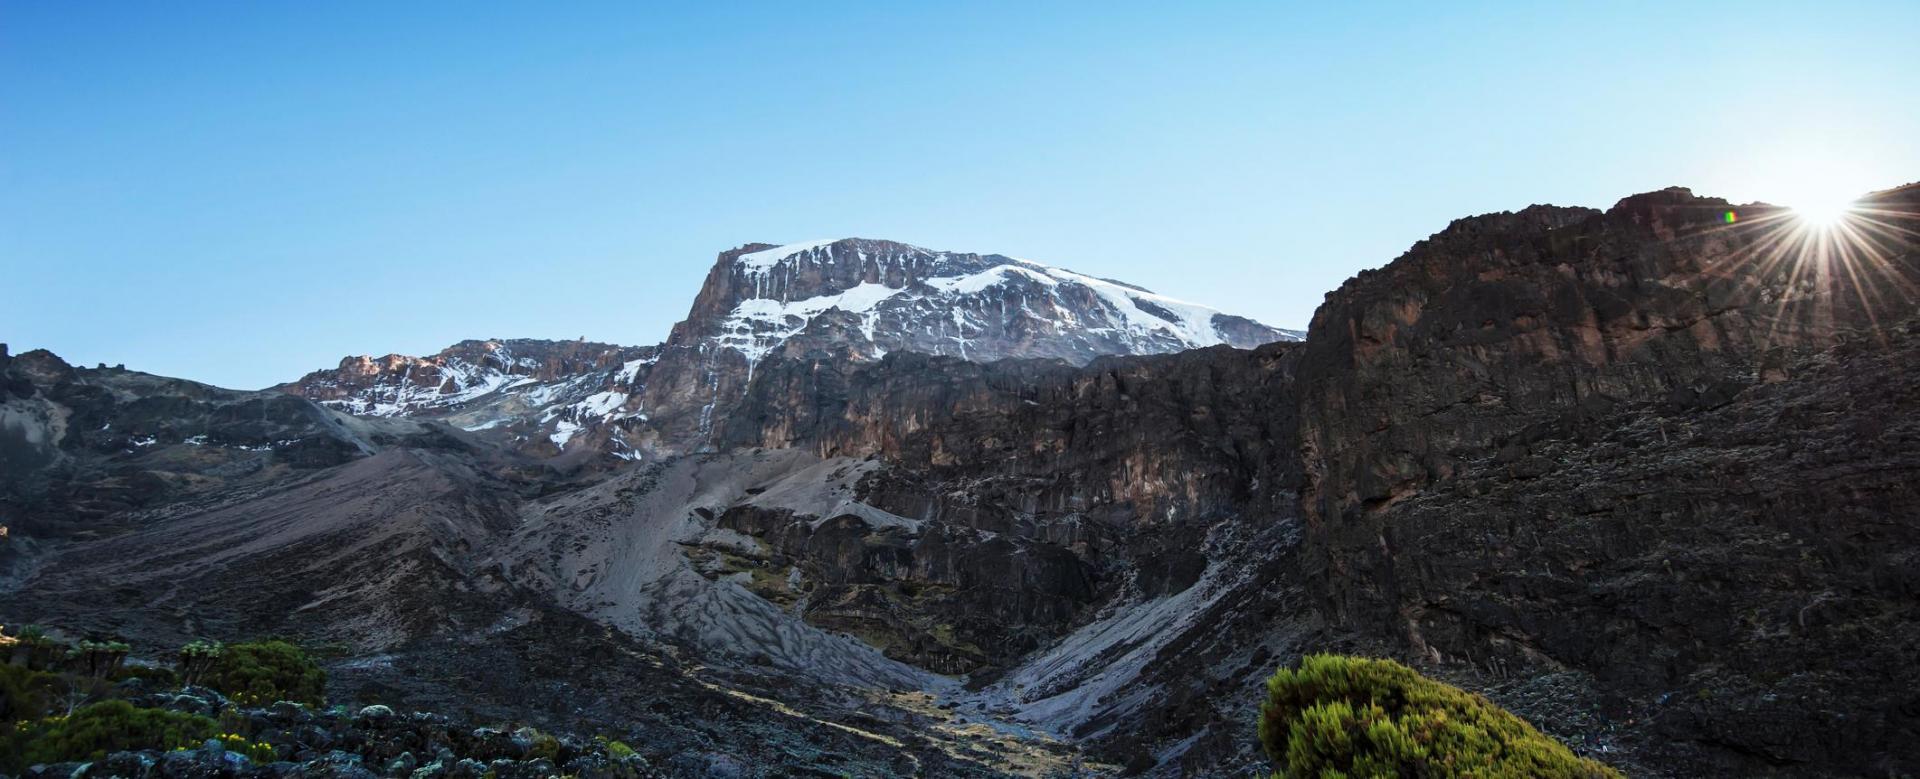 Voyage à pied Tanzanie : Kilimandjaro : voie rongai